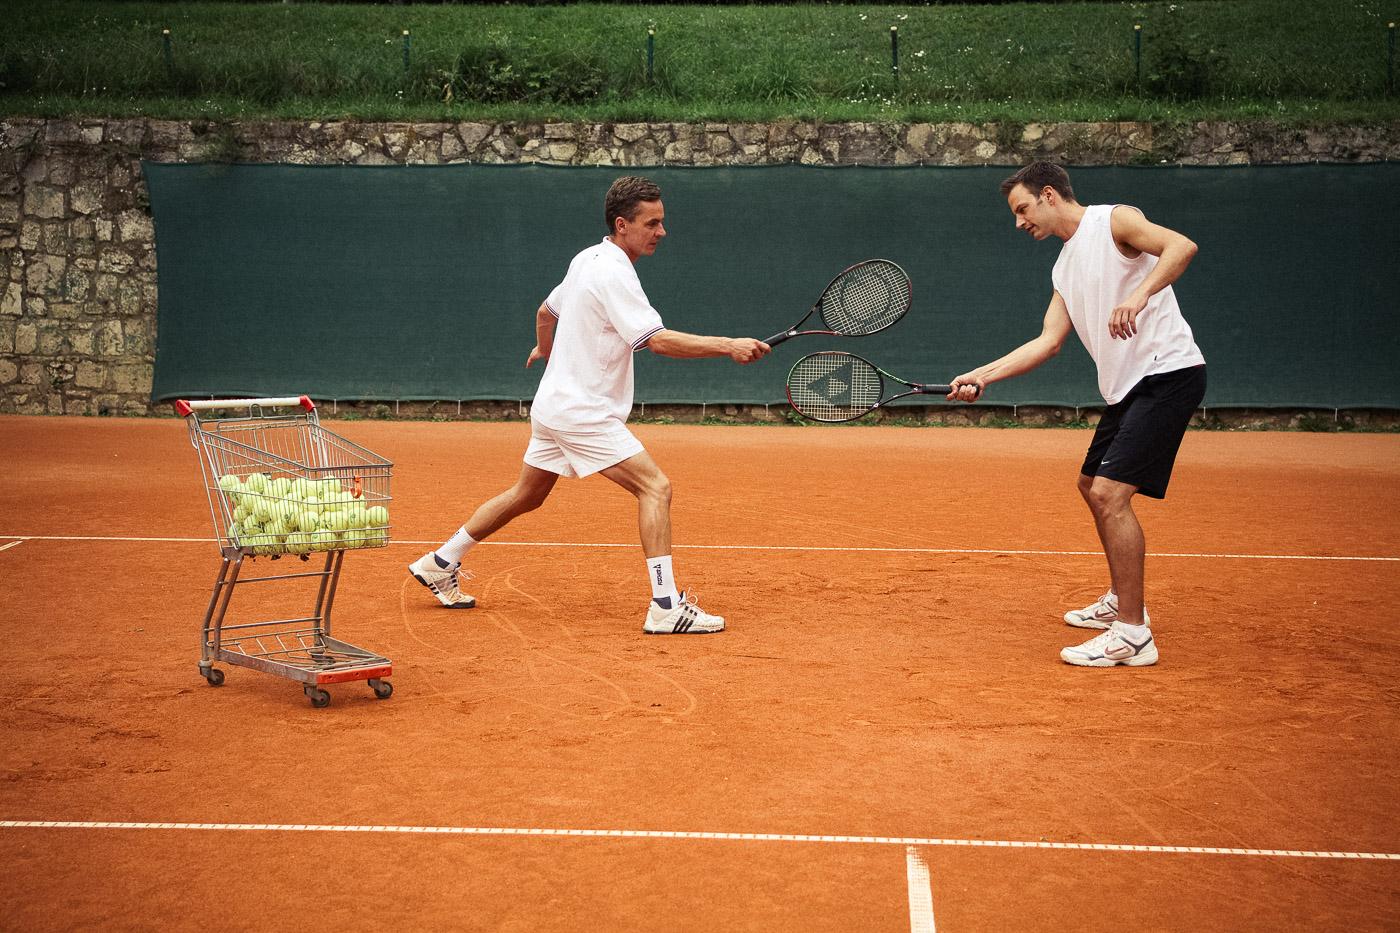 Tennis1A Einsteiger/Wiedereinsteiger/leicht Fortgeschrittenenkurs